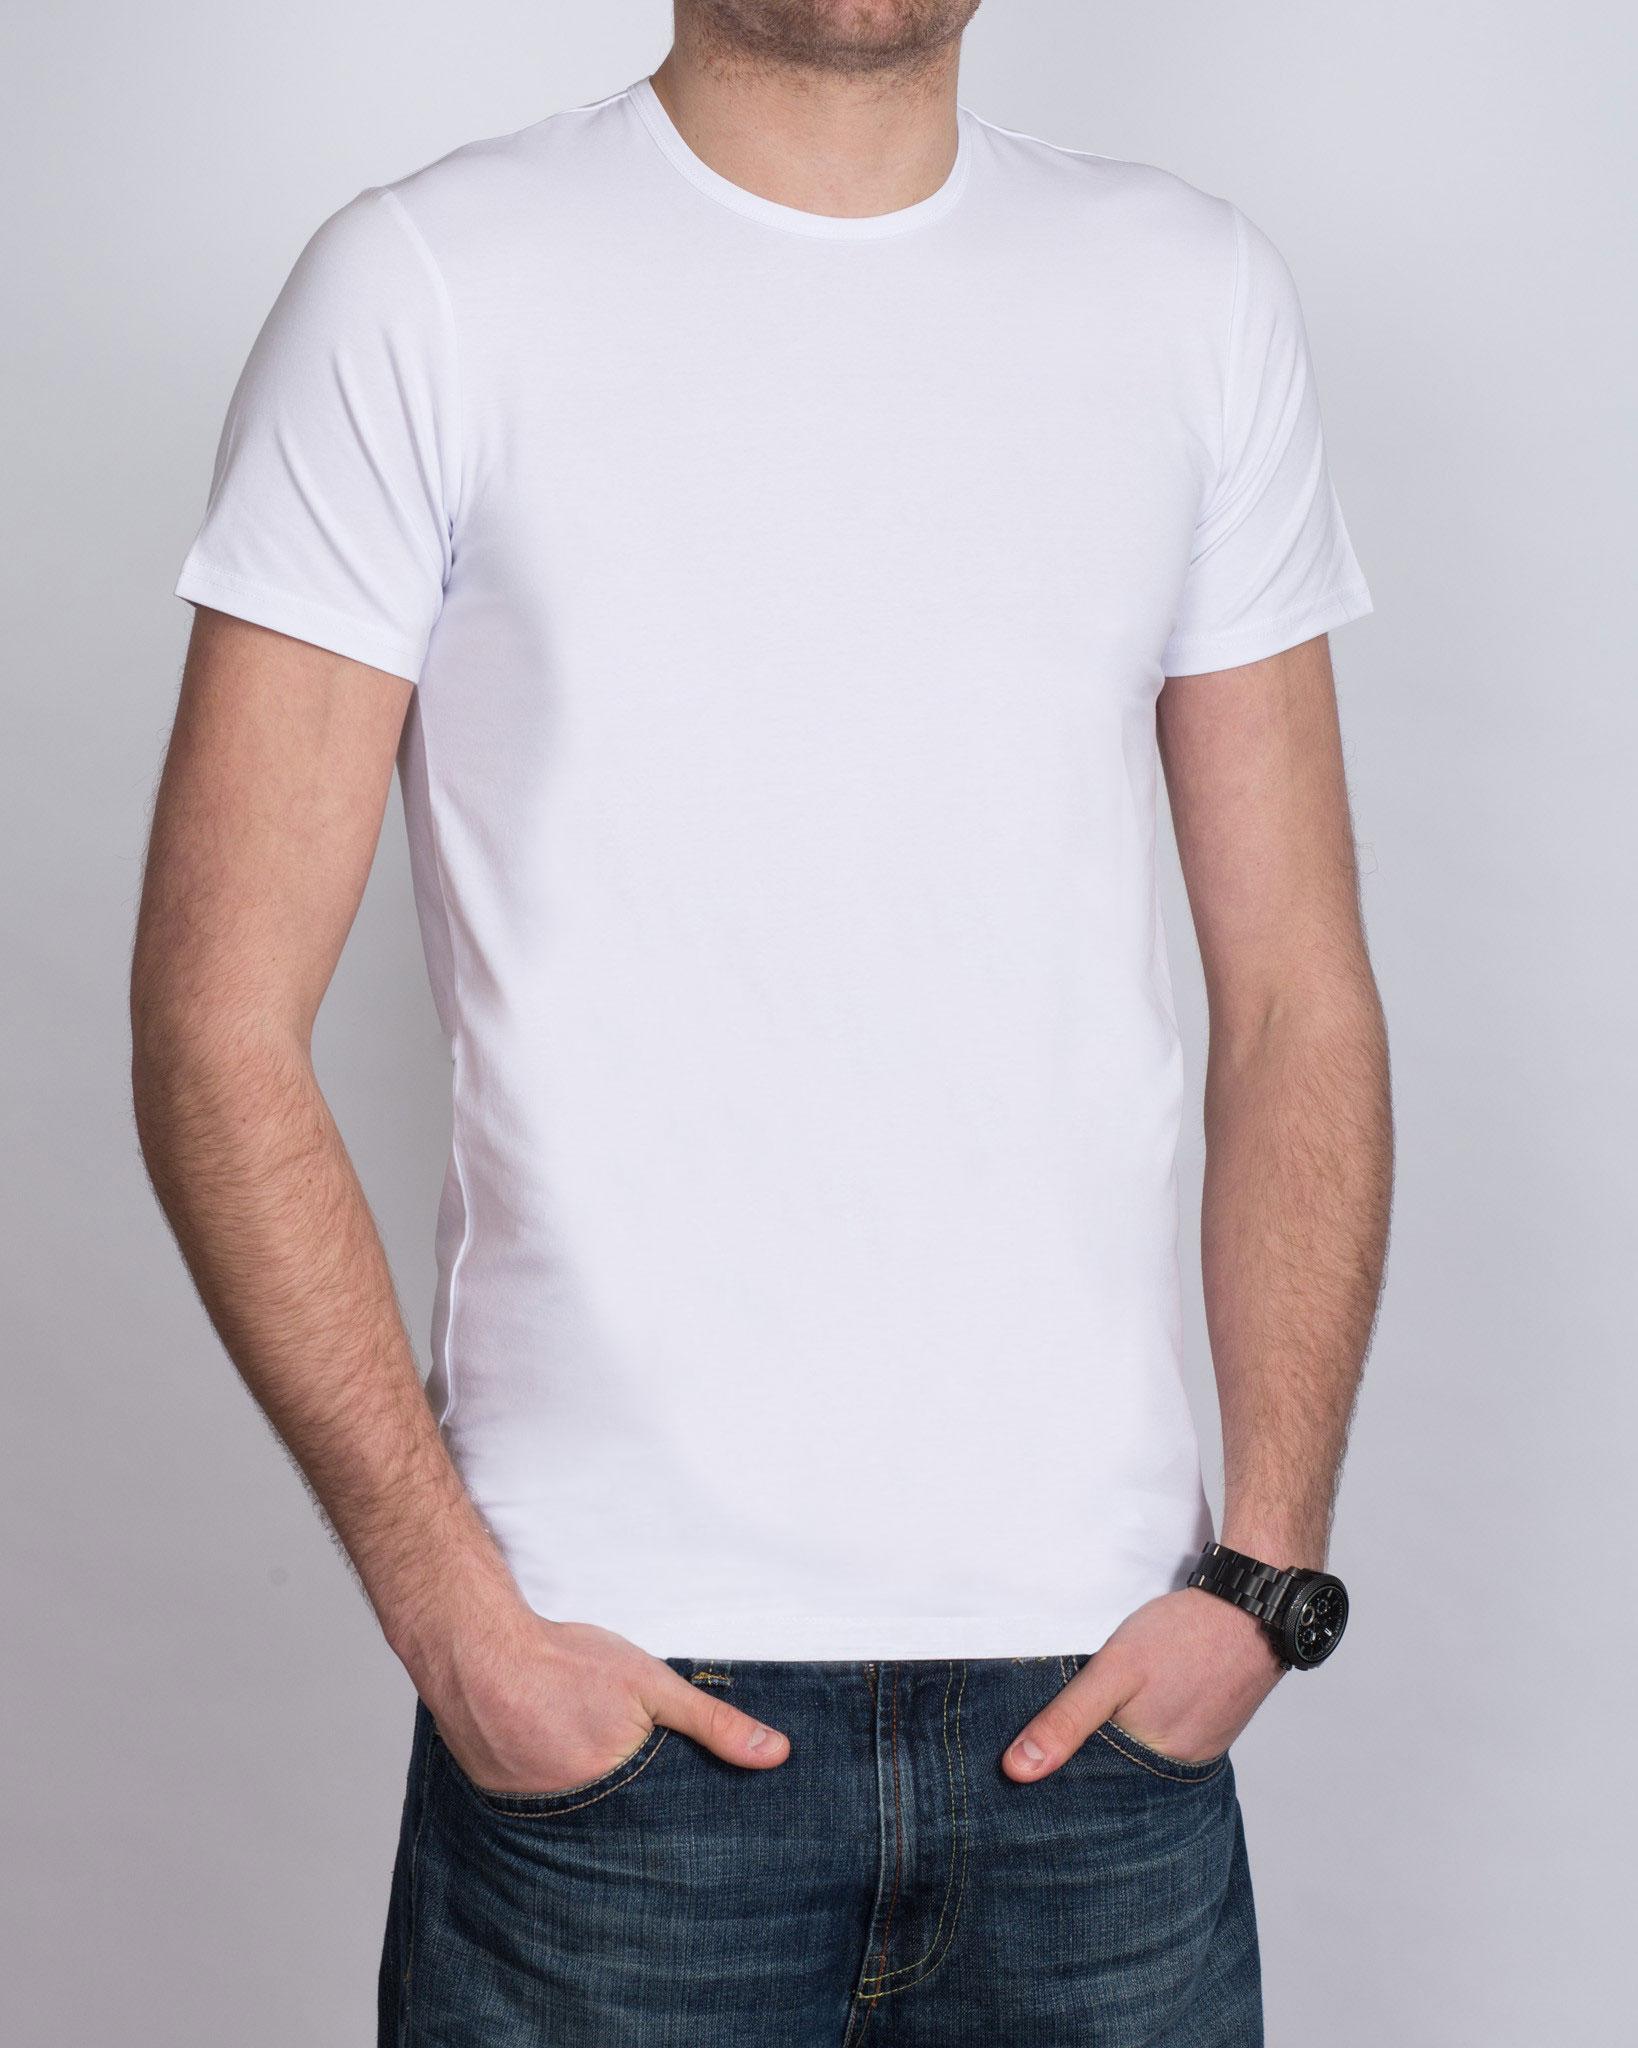 Girav Fitted Tall T-Shirt (white) Twin Pack